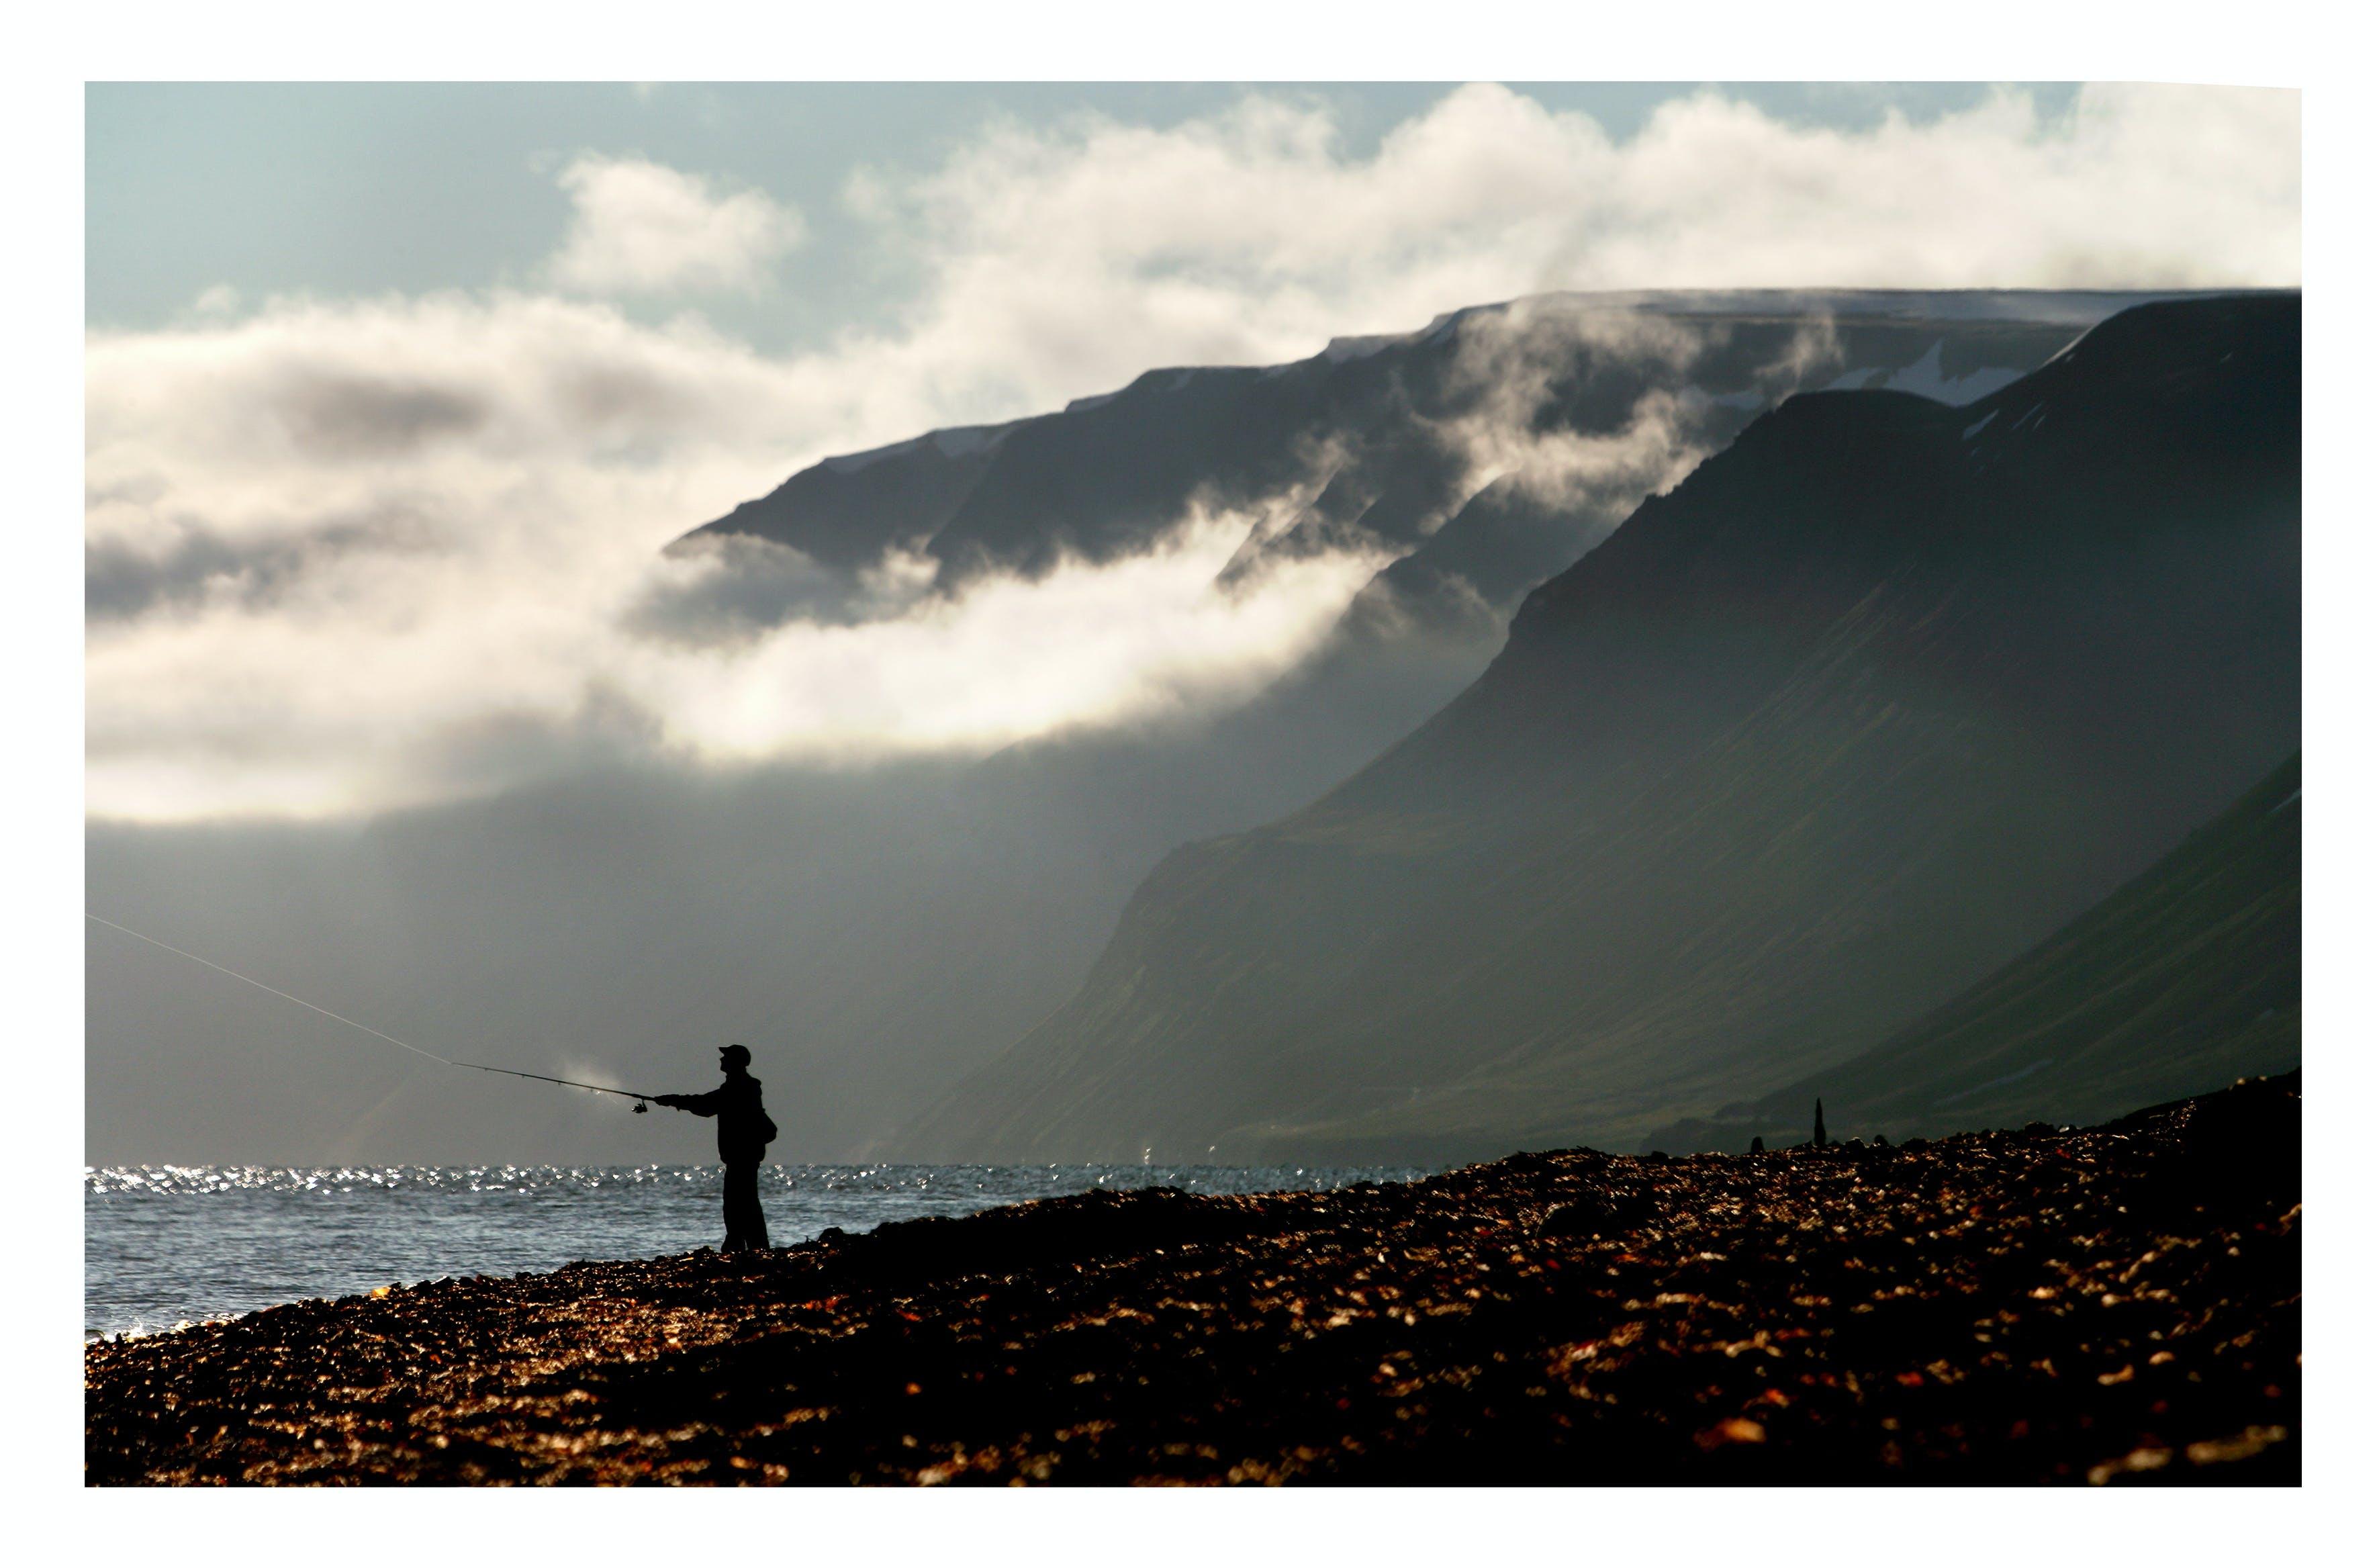 Svalbard: Norway's crown jewel in the North Vol. 1